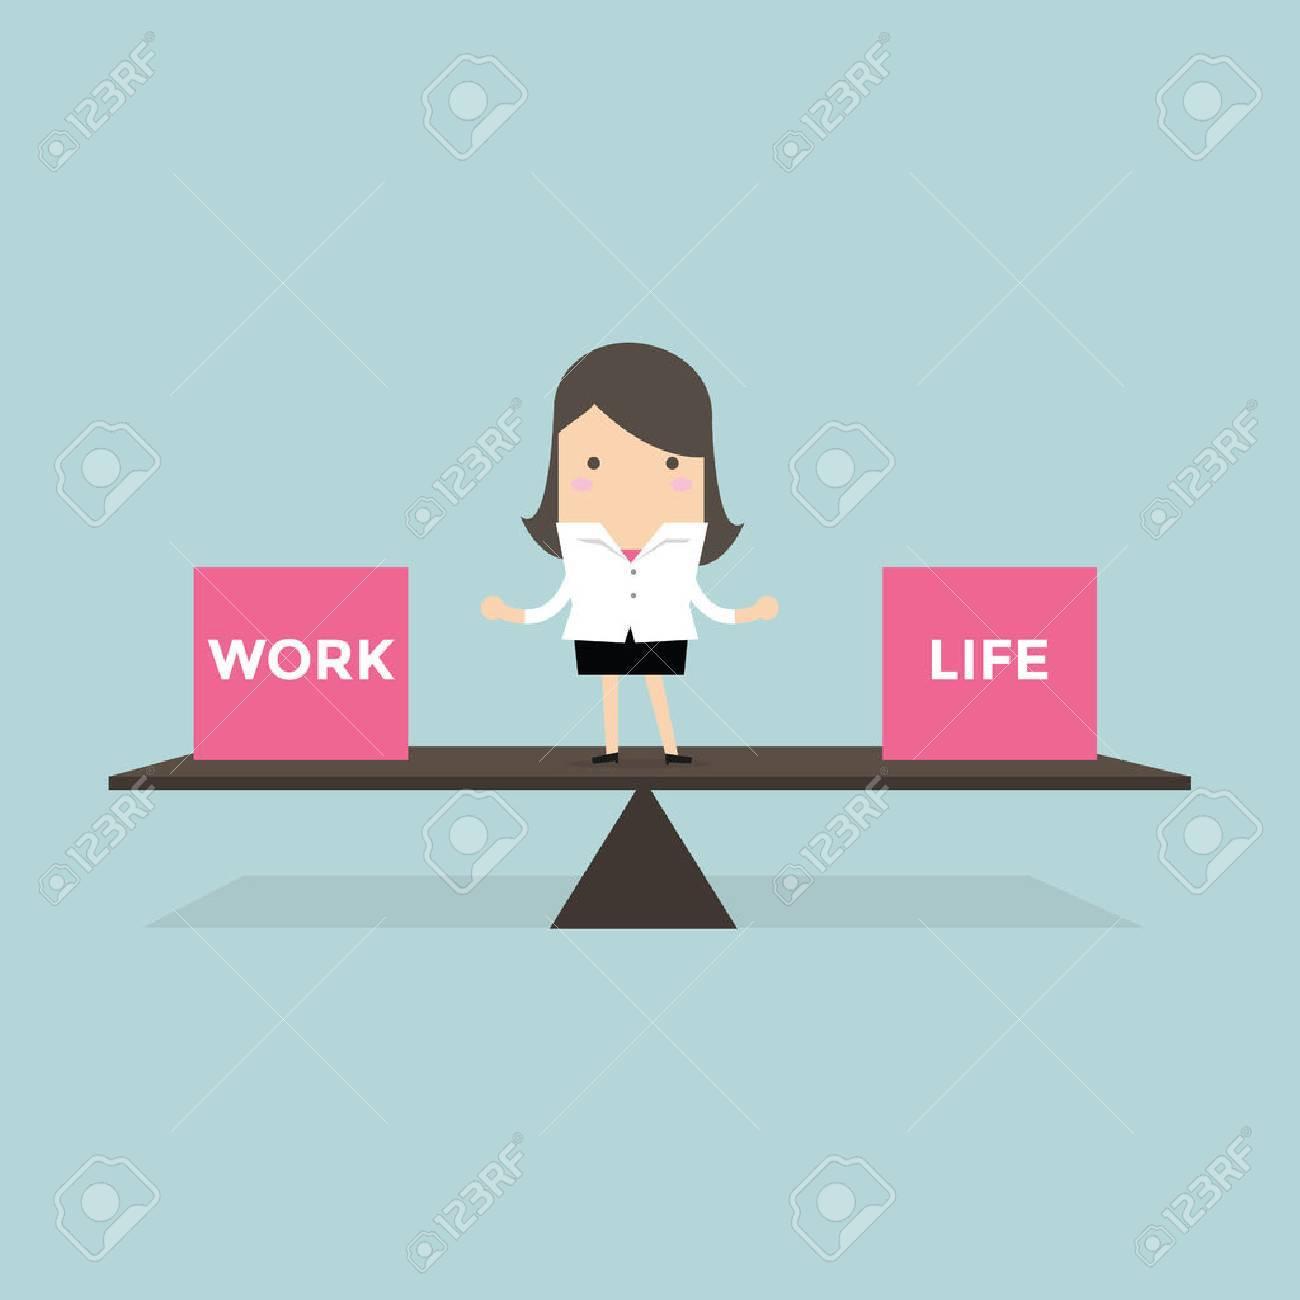 Businesswoman balance Work and life - 53893896